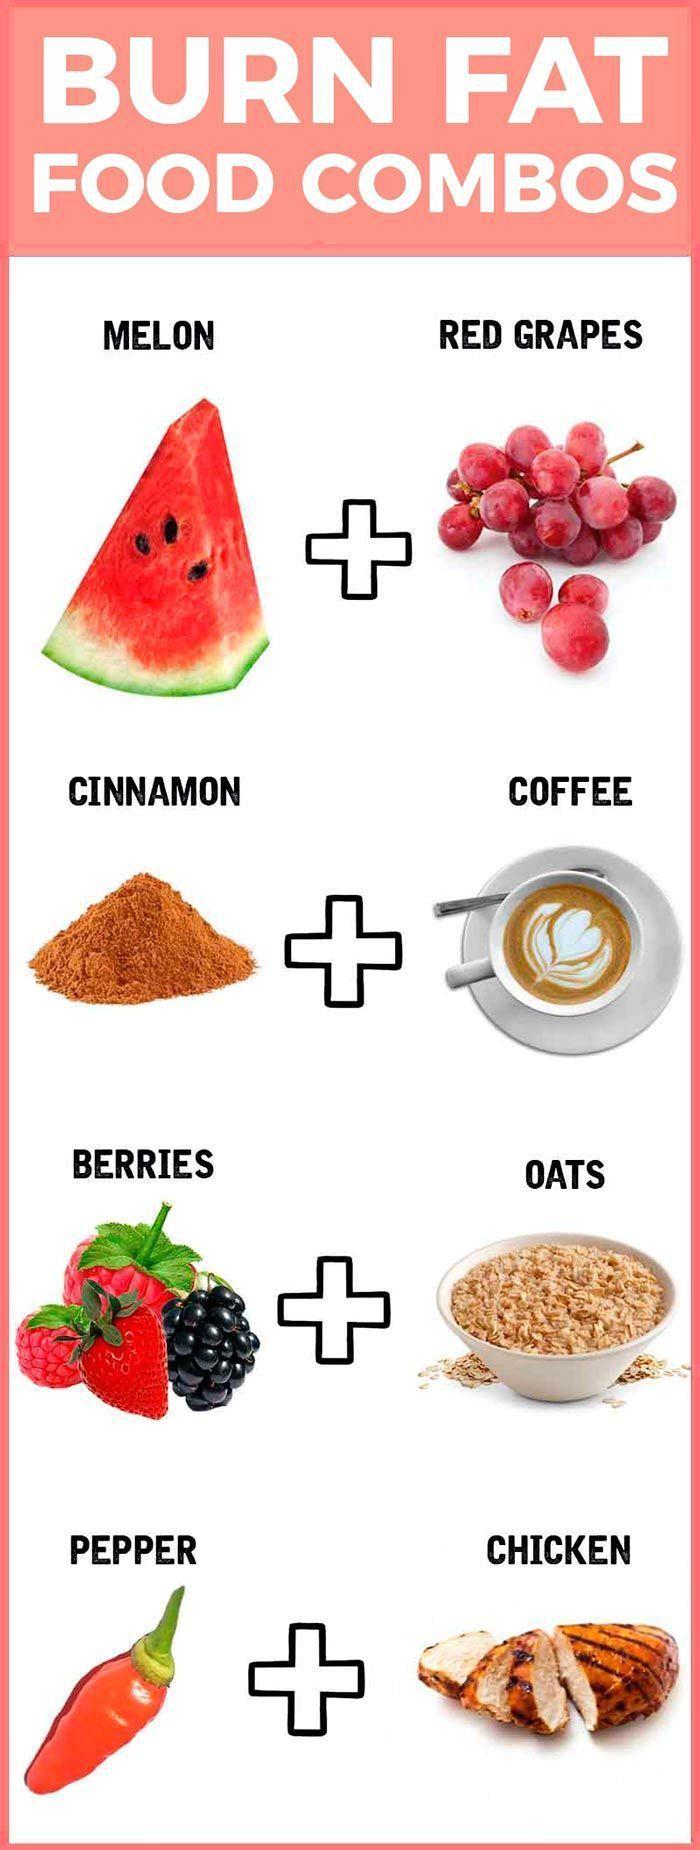 Fat-burning foods. Burn fat food combinations